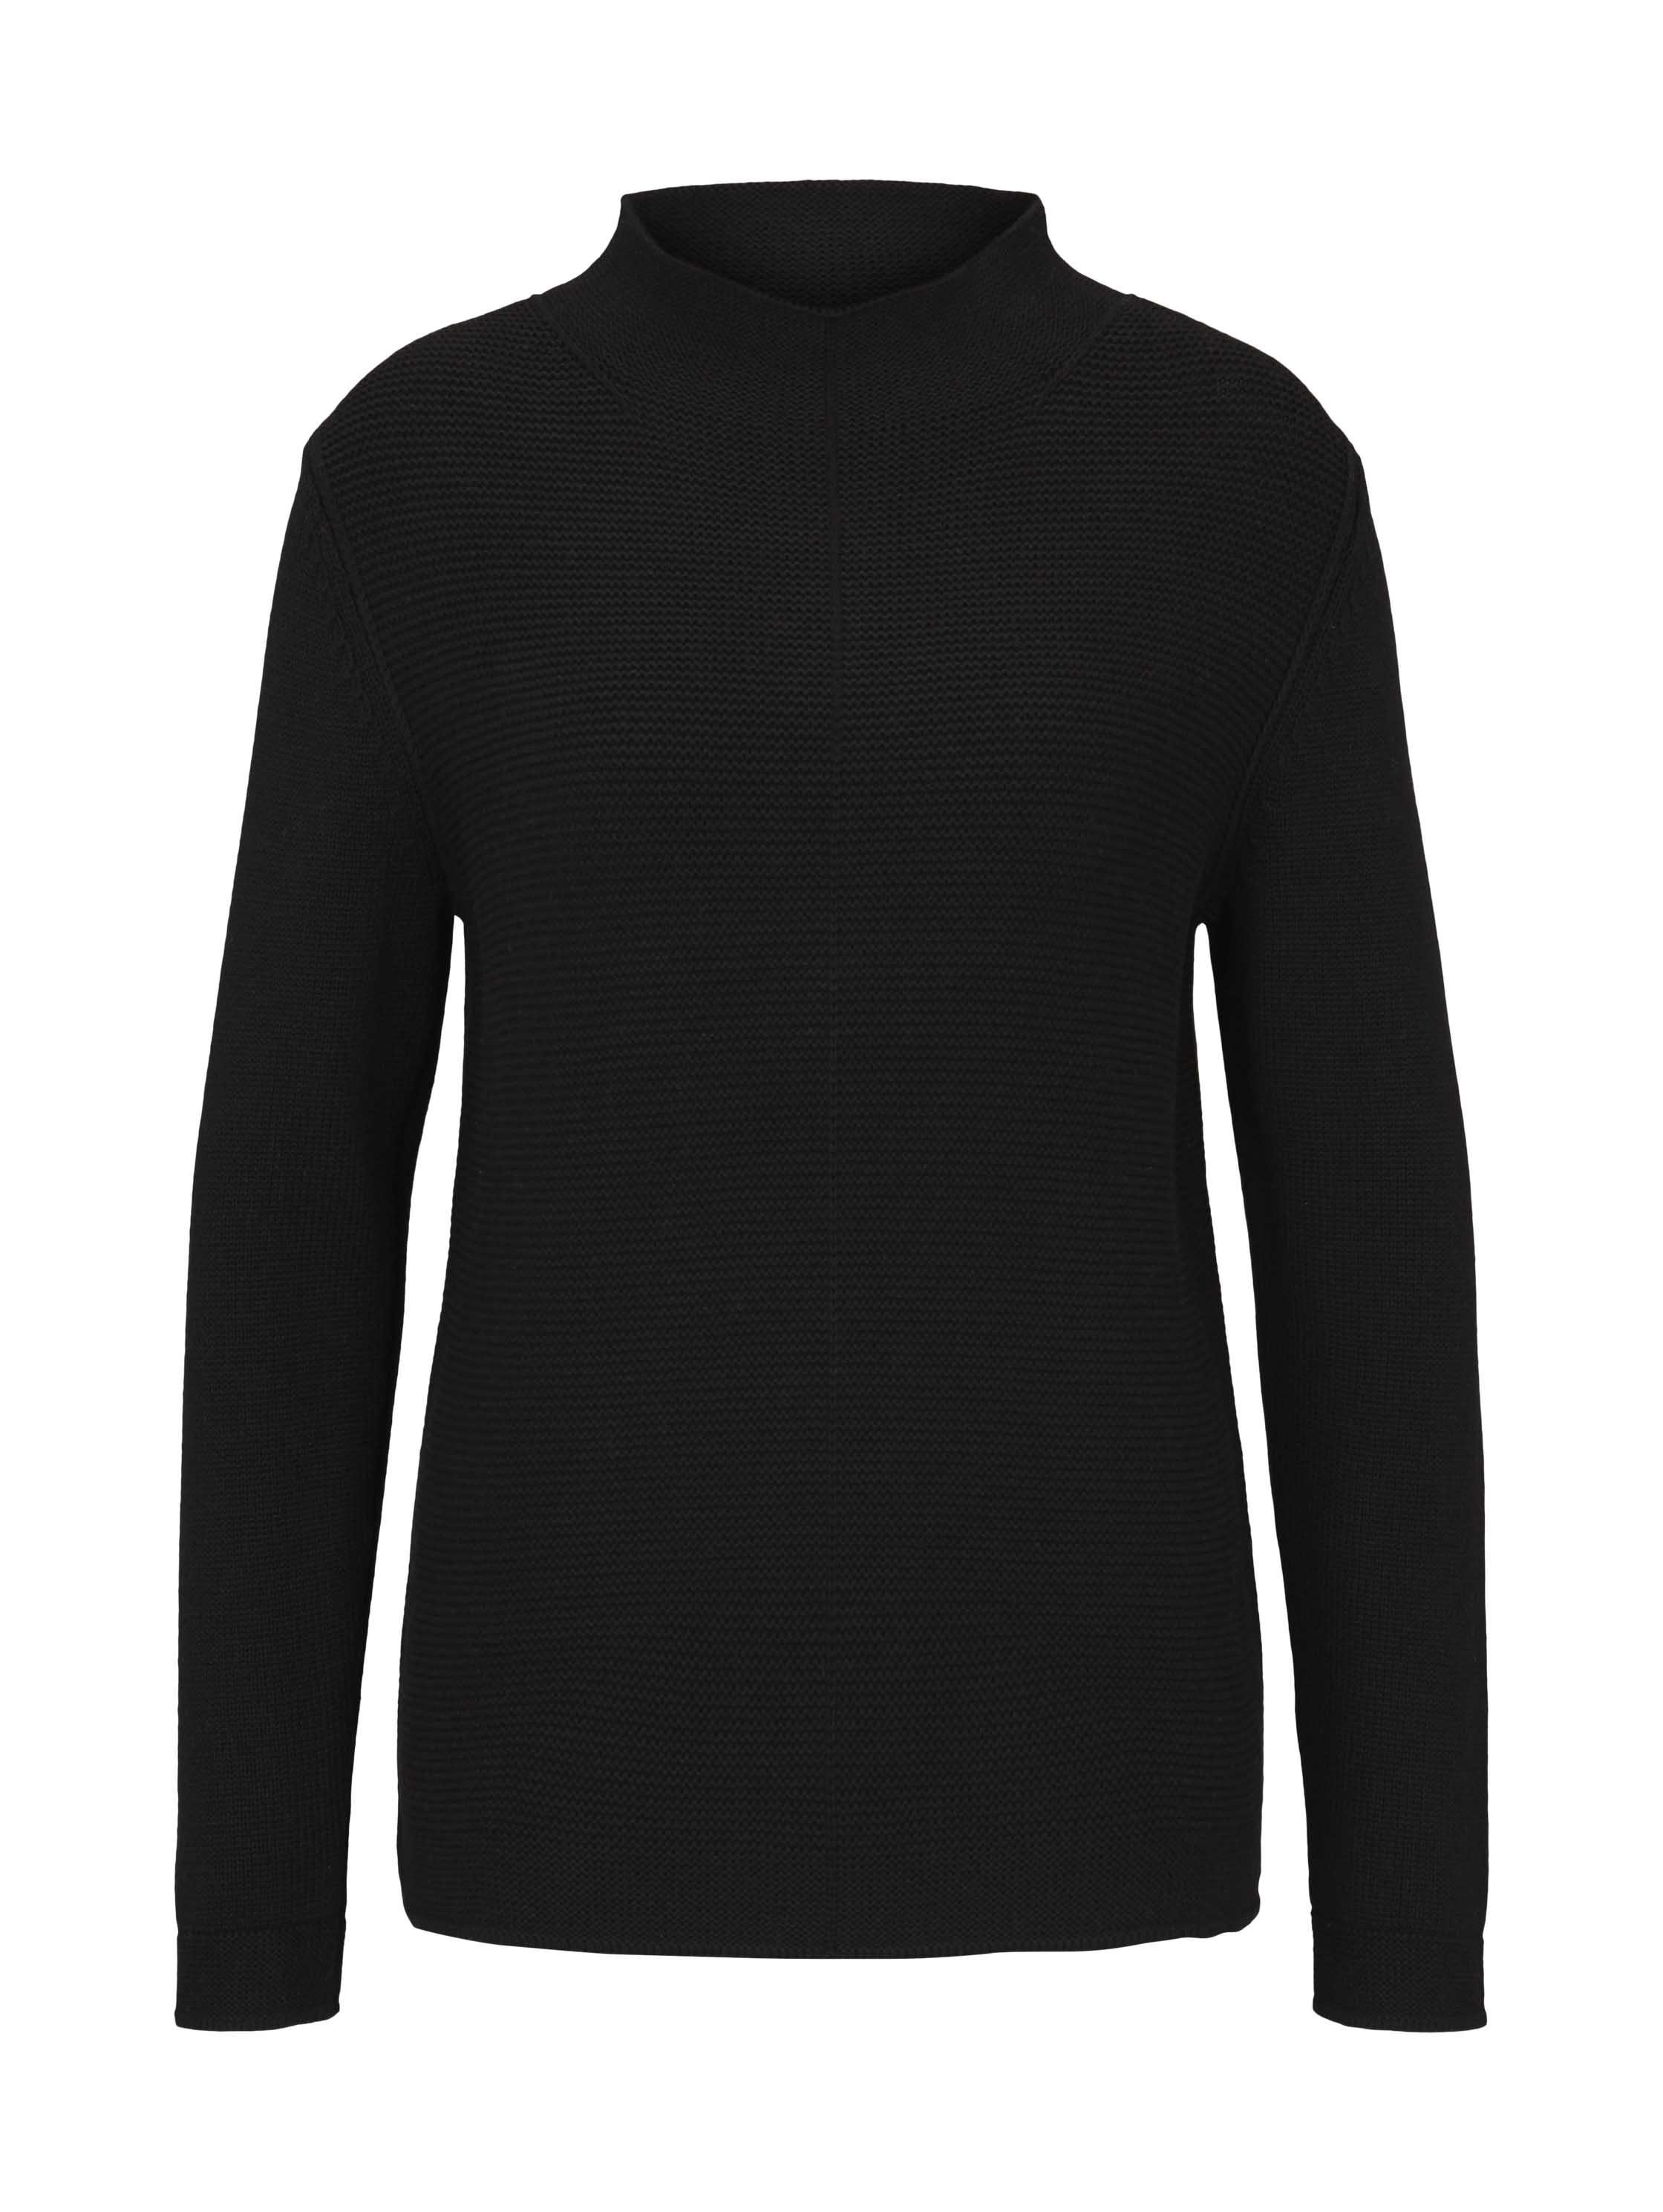 pullover cotton structure mix, Deep Black